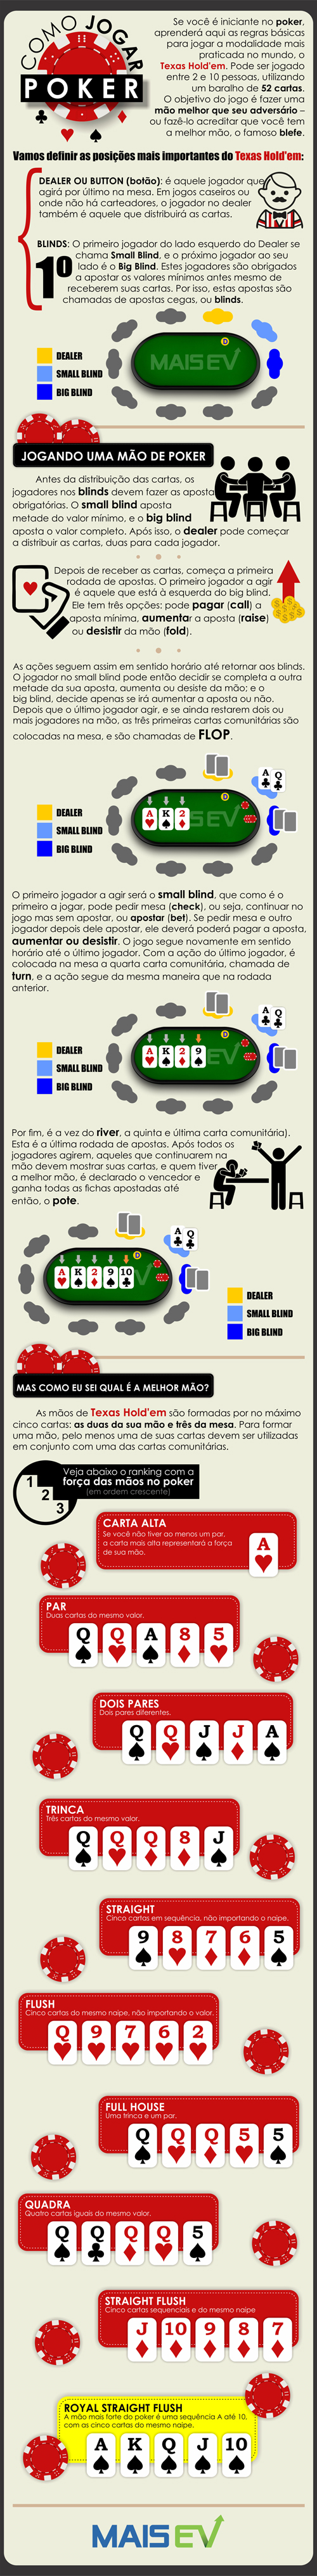 infografico_como_jogar_poker